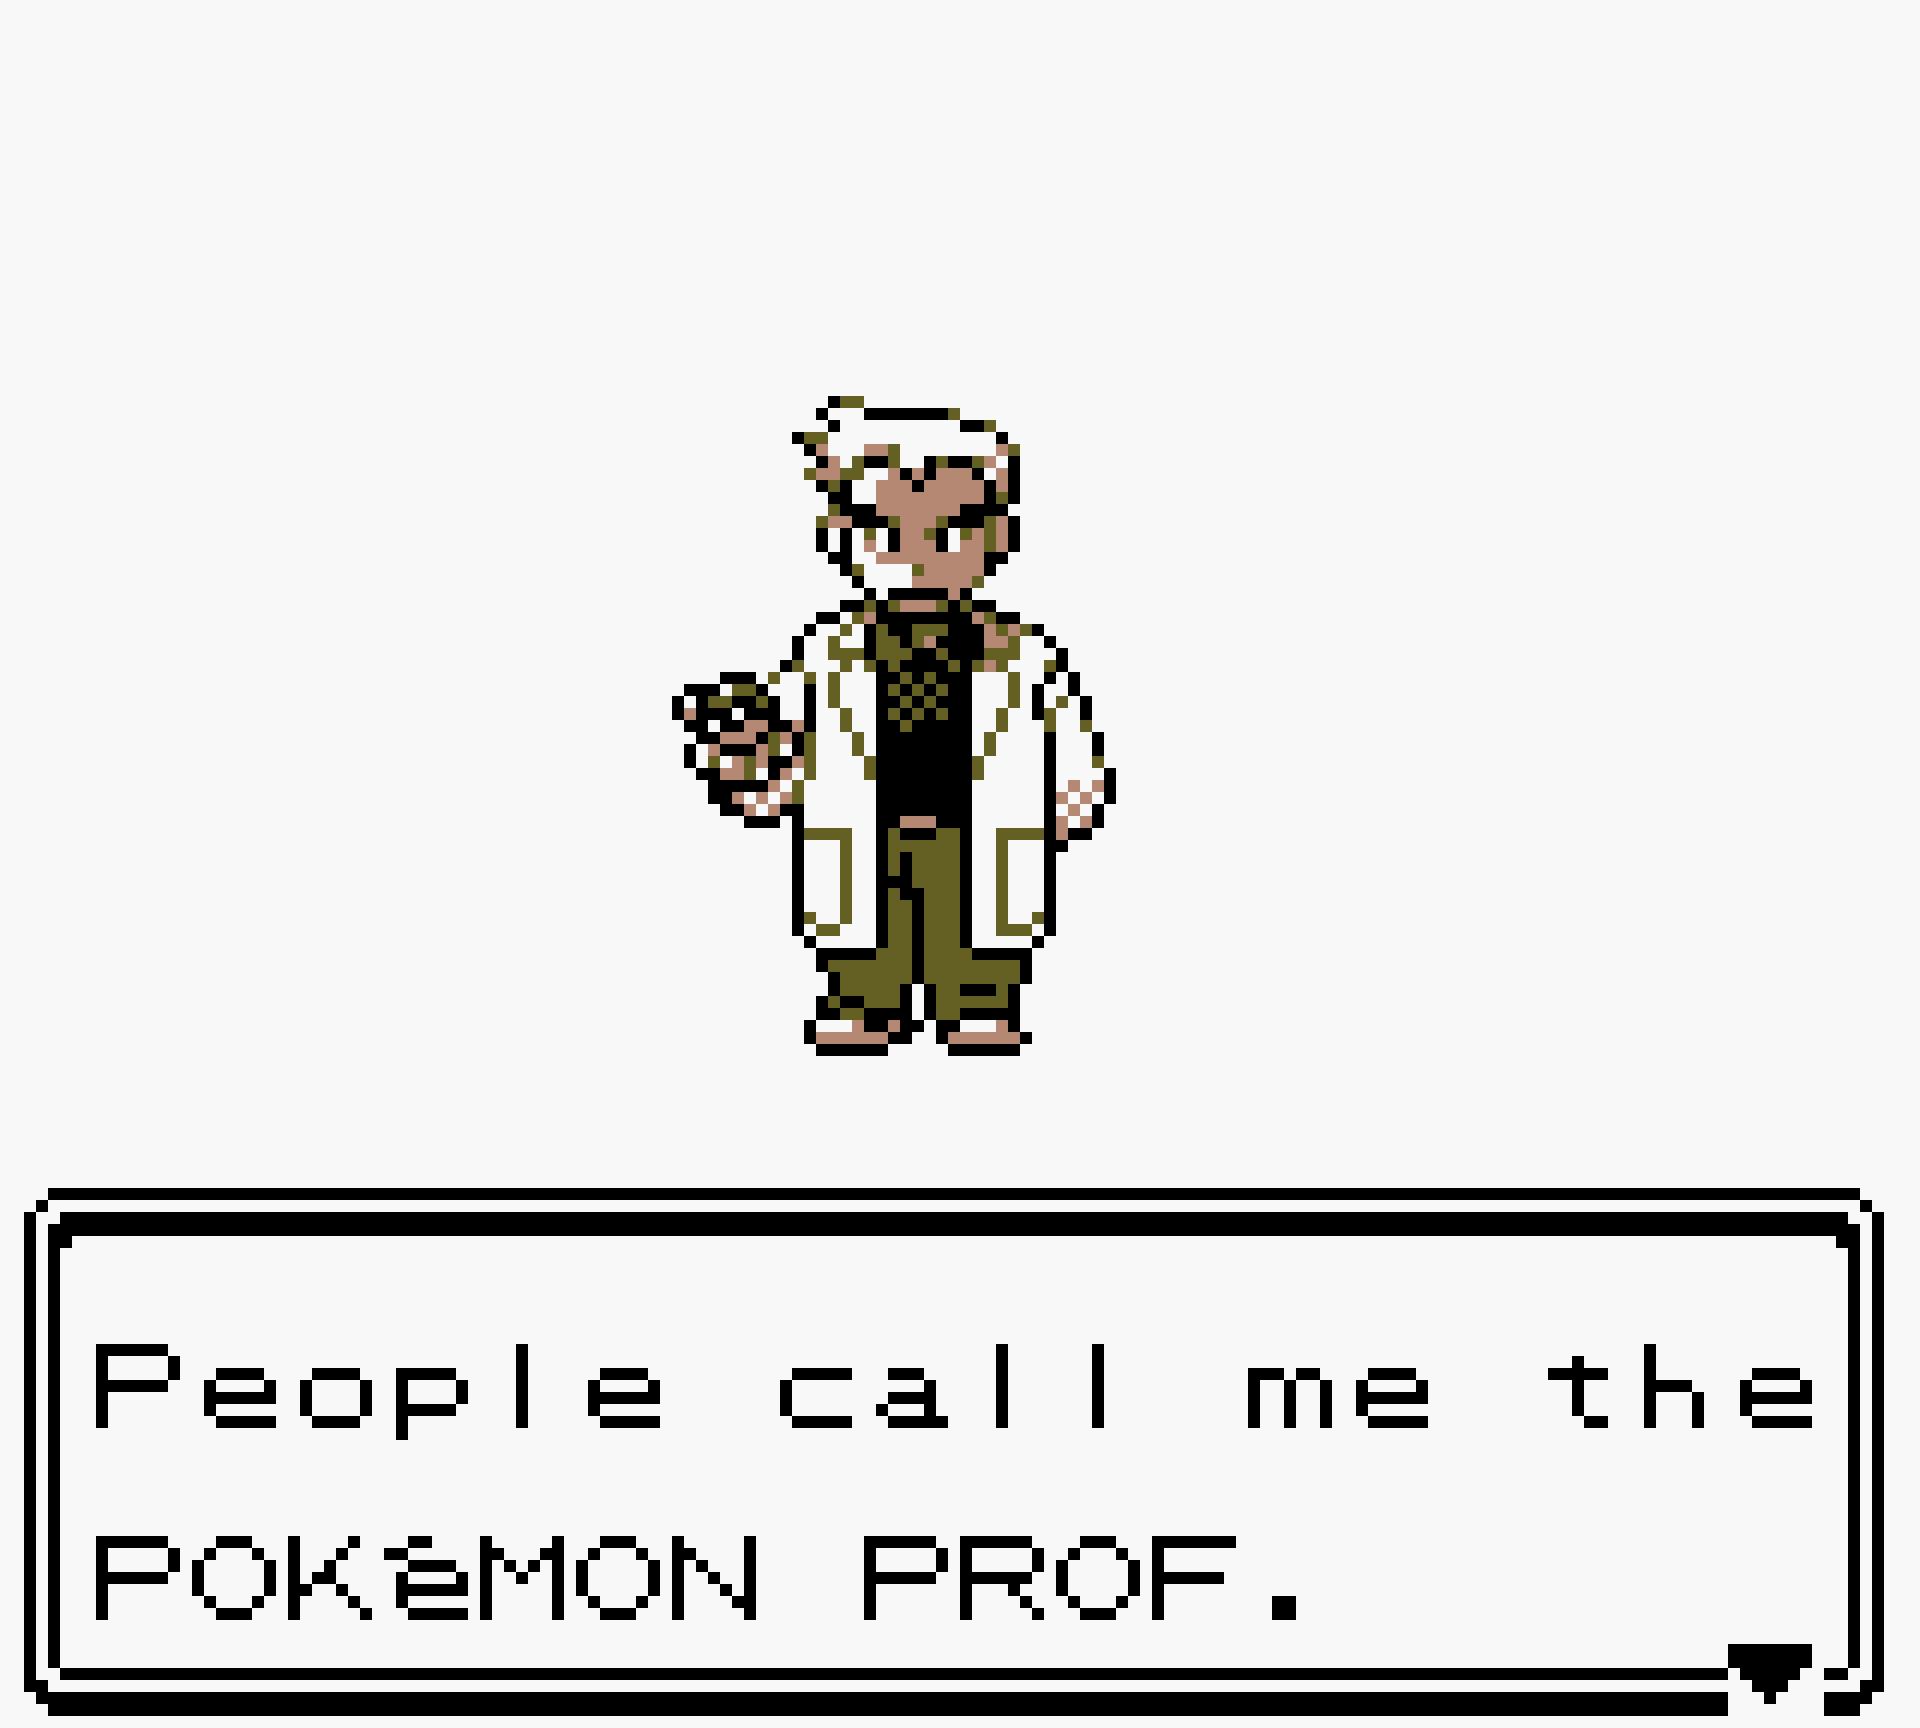 Pokemon_Crystal_Nuzlocke_2021-10-10_23.44.52.png